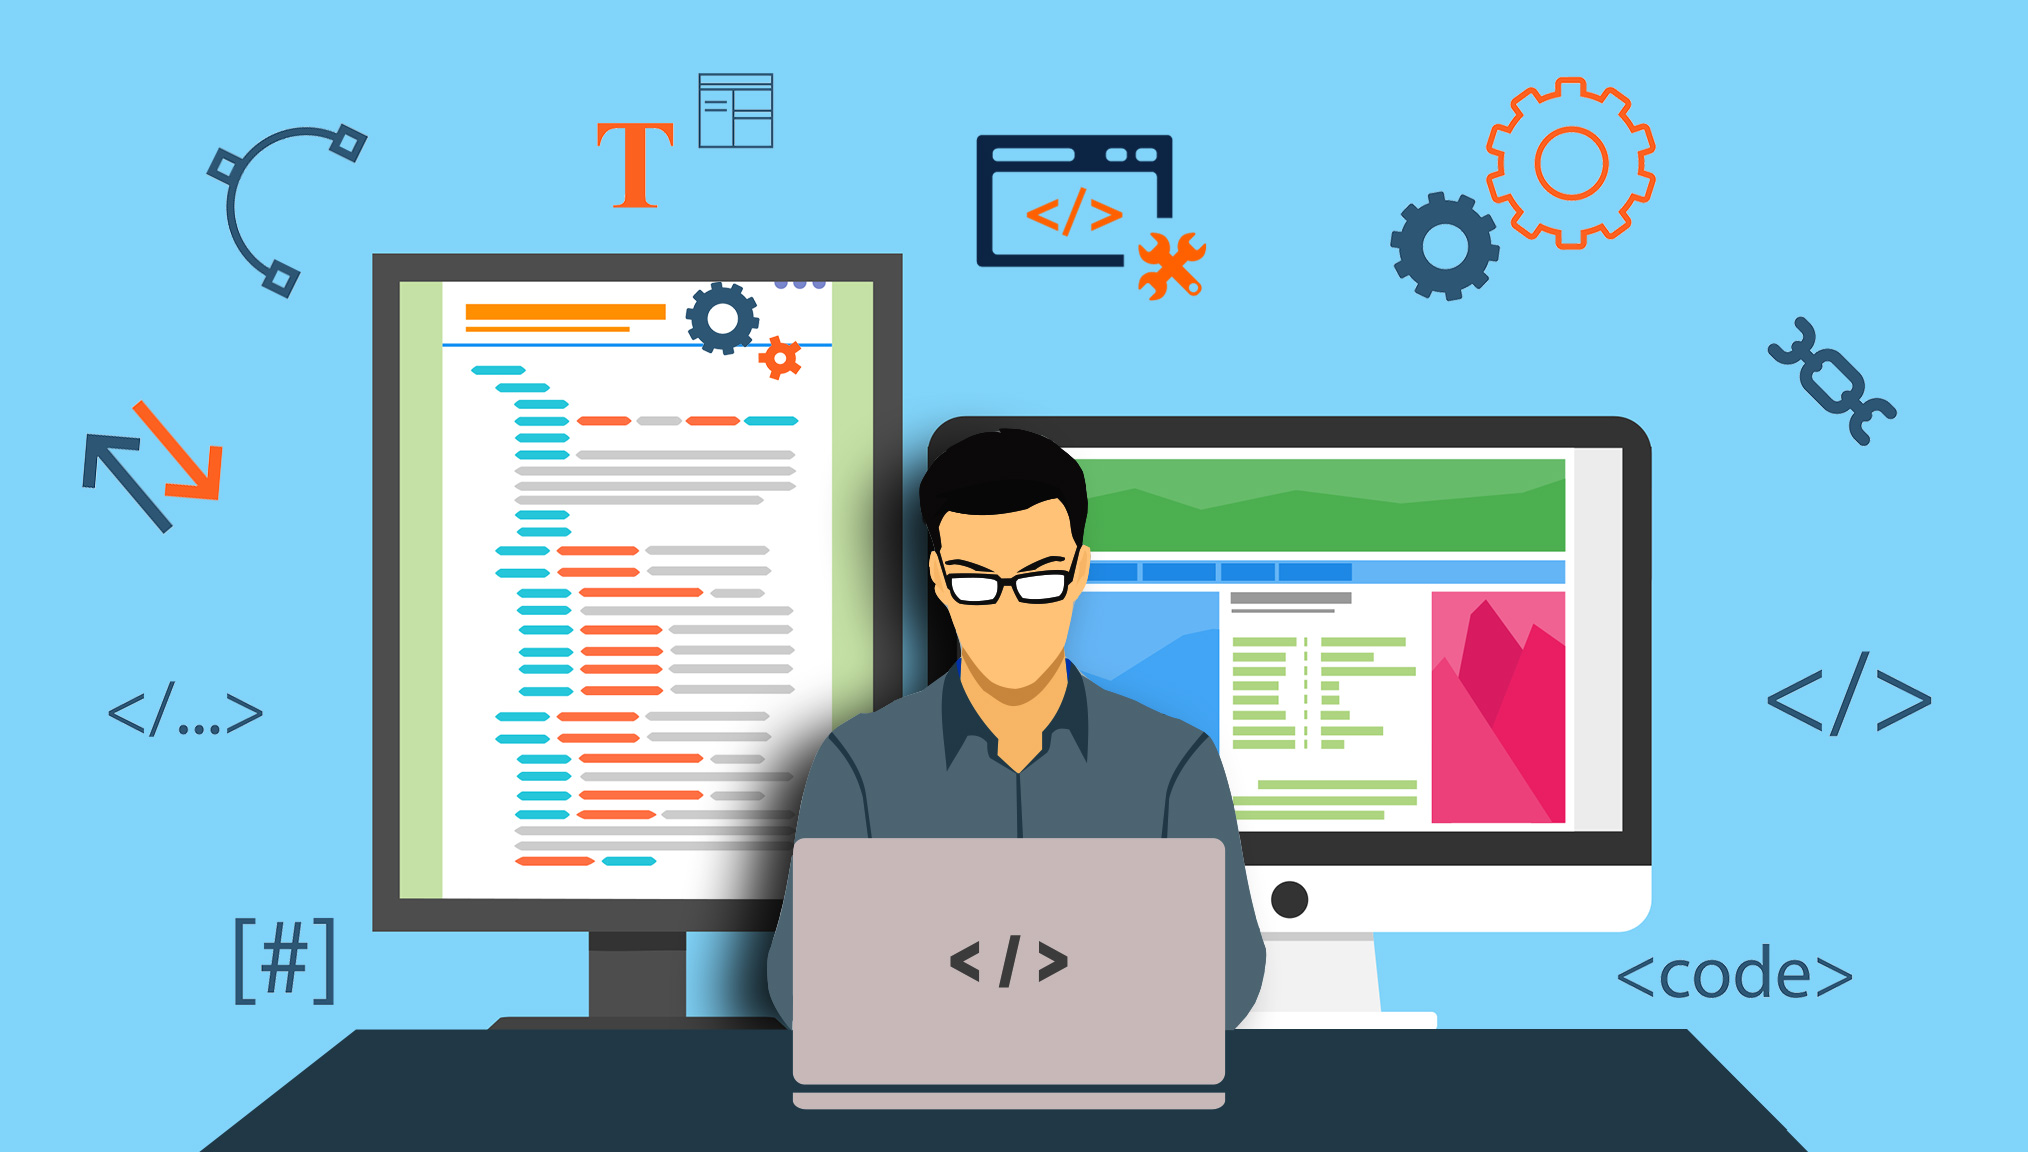 web-development-skills.jpg